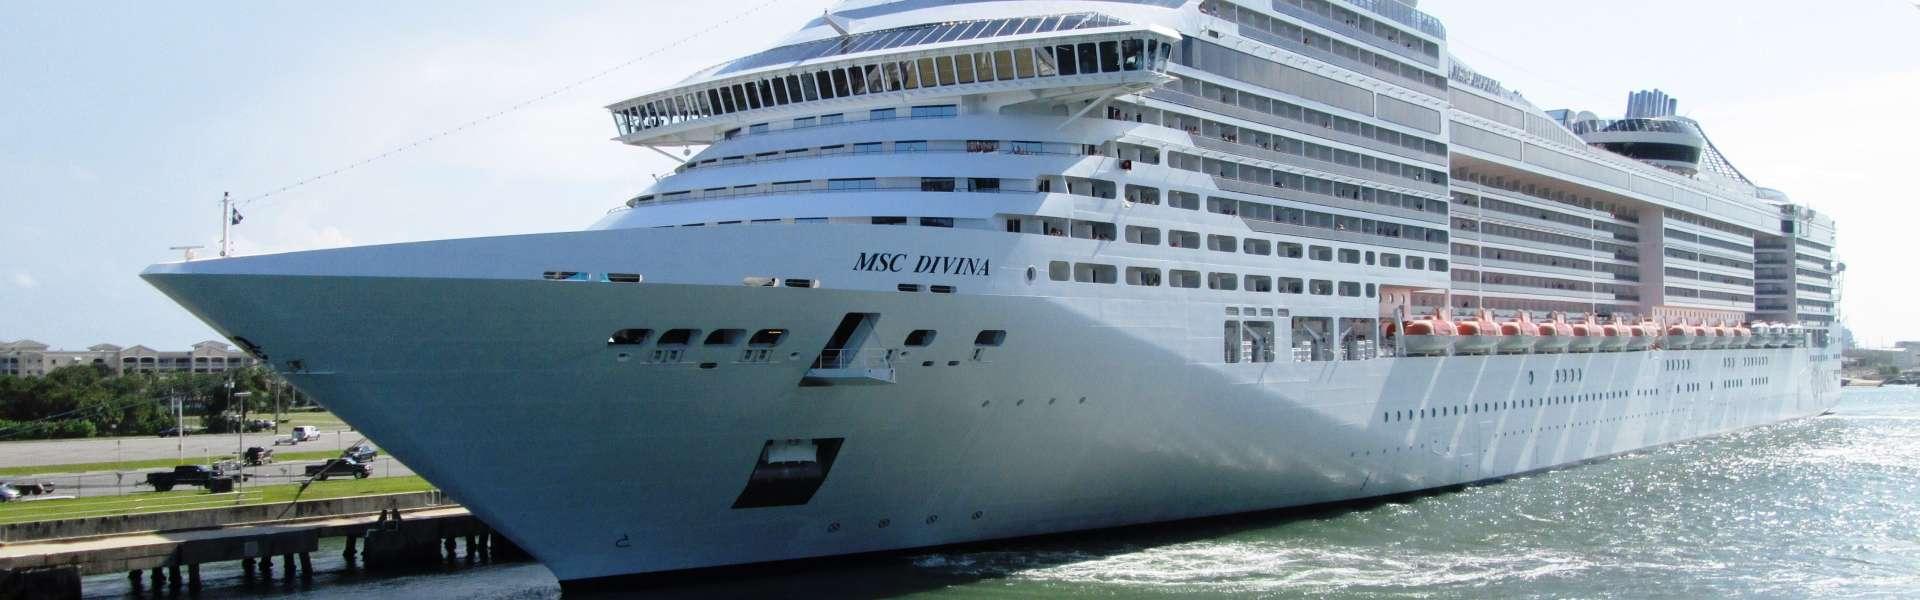 Croaziera 2019 - Mediterana de Vest (Marsilia) - MSC Cruises - MSC Divina - 7 nopti